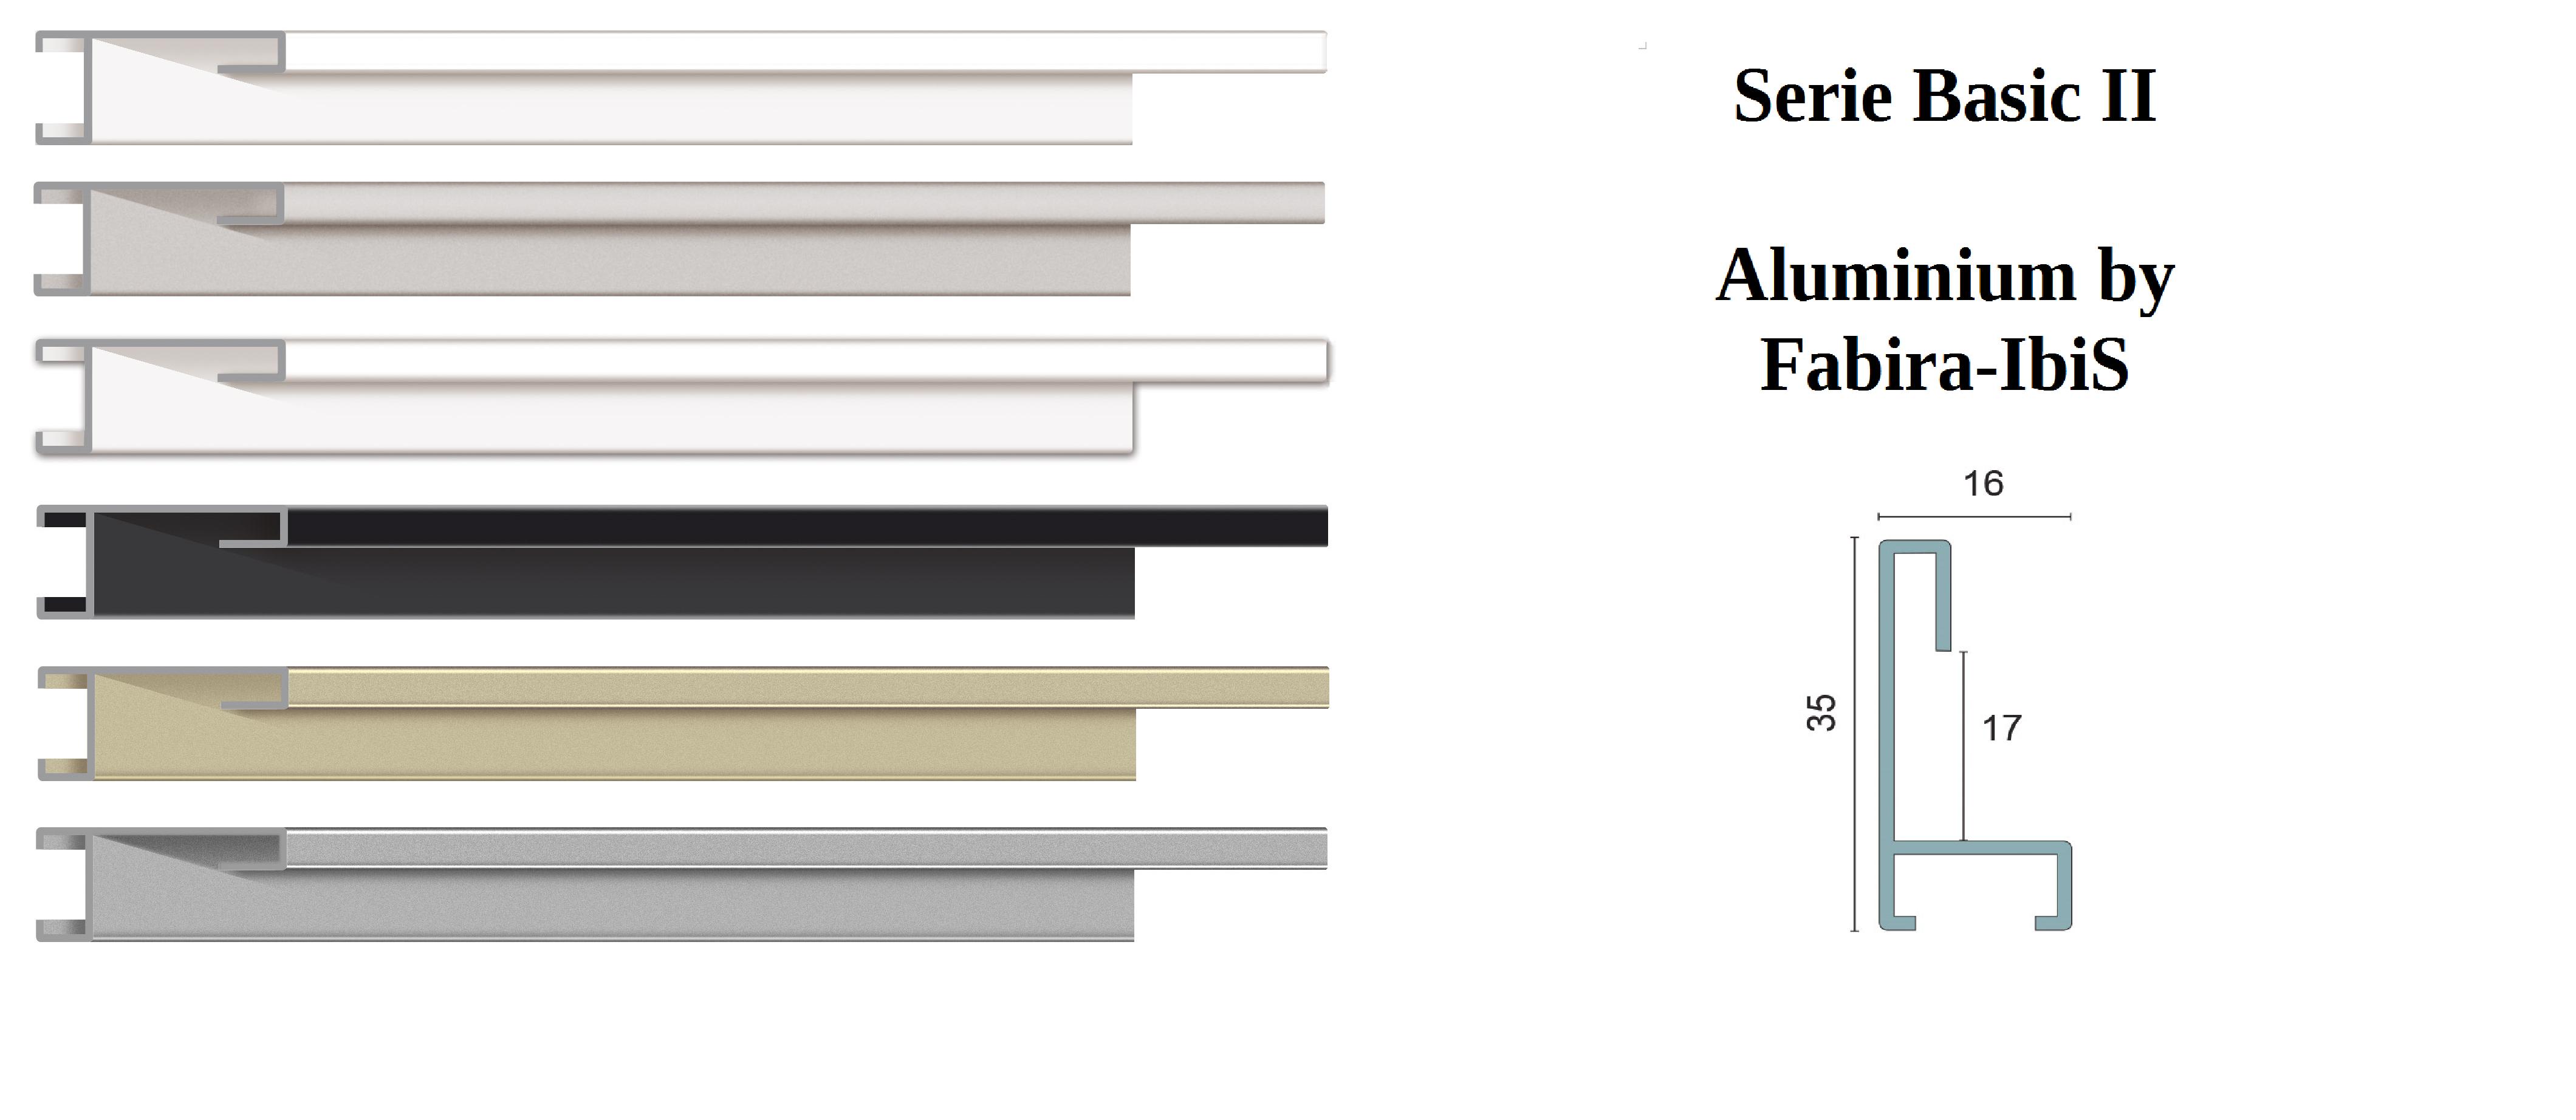 Fabira-IbiS Aluminium: Basic II